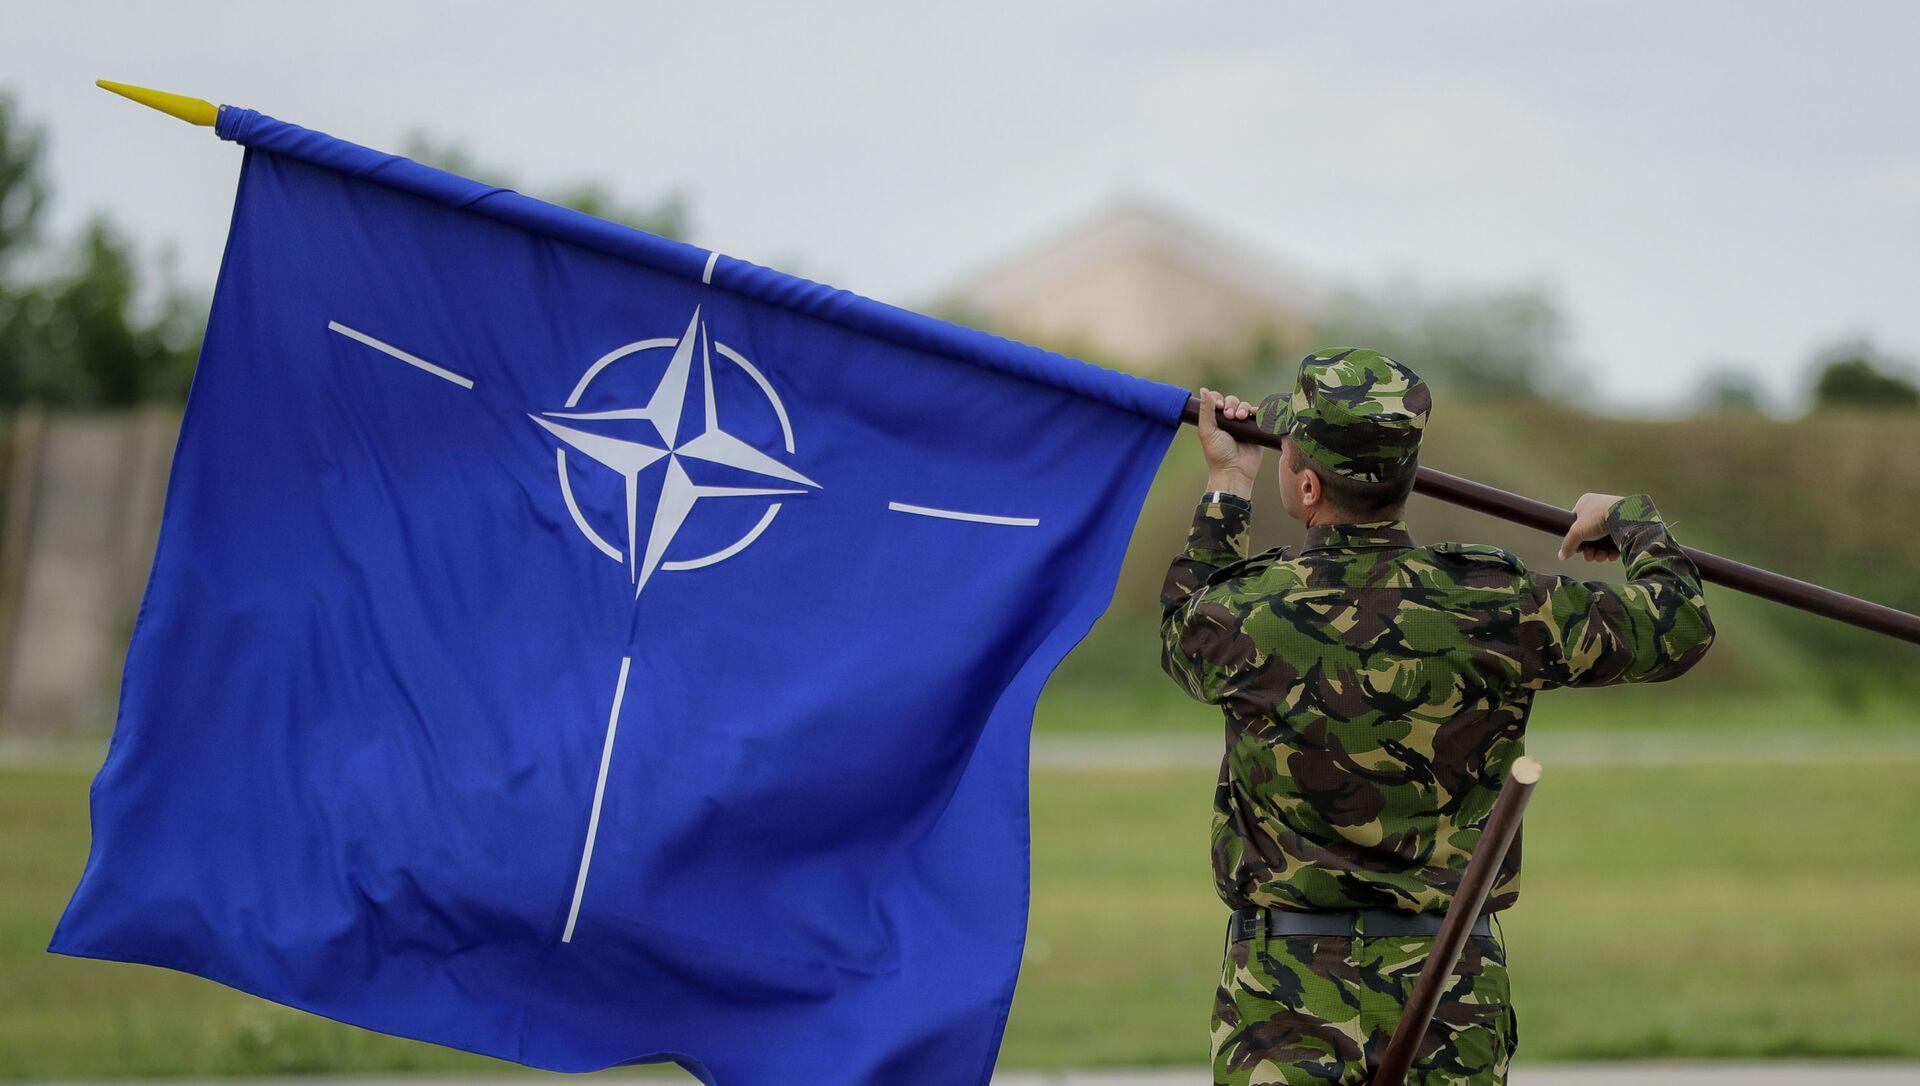 Мужчина с флагом НАТО, фото из архива - Sputnik Азербайджан, 1920, 03.09.2021